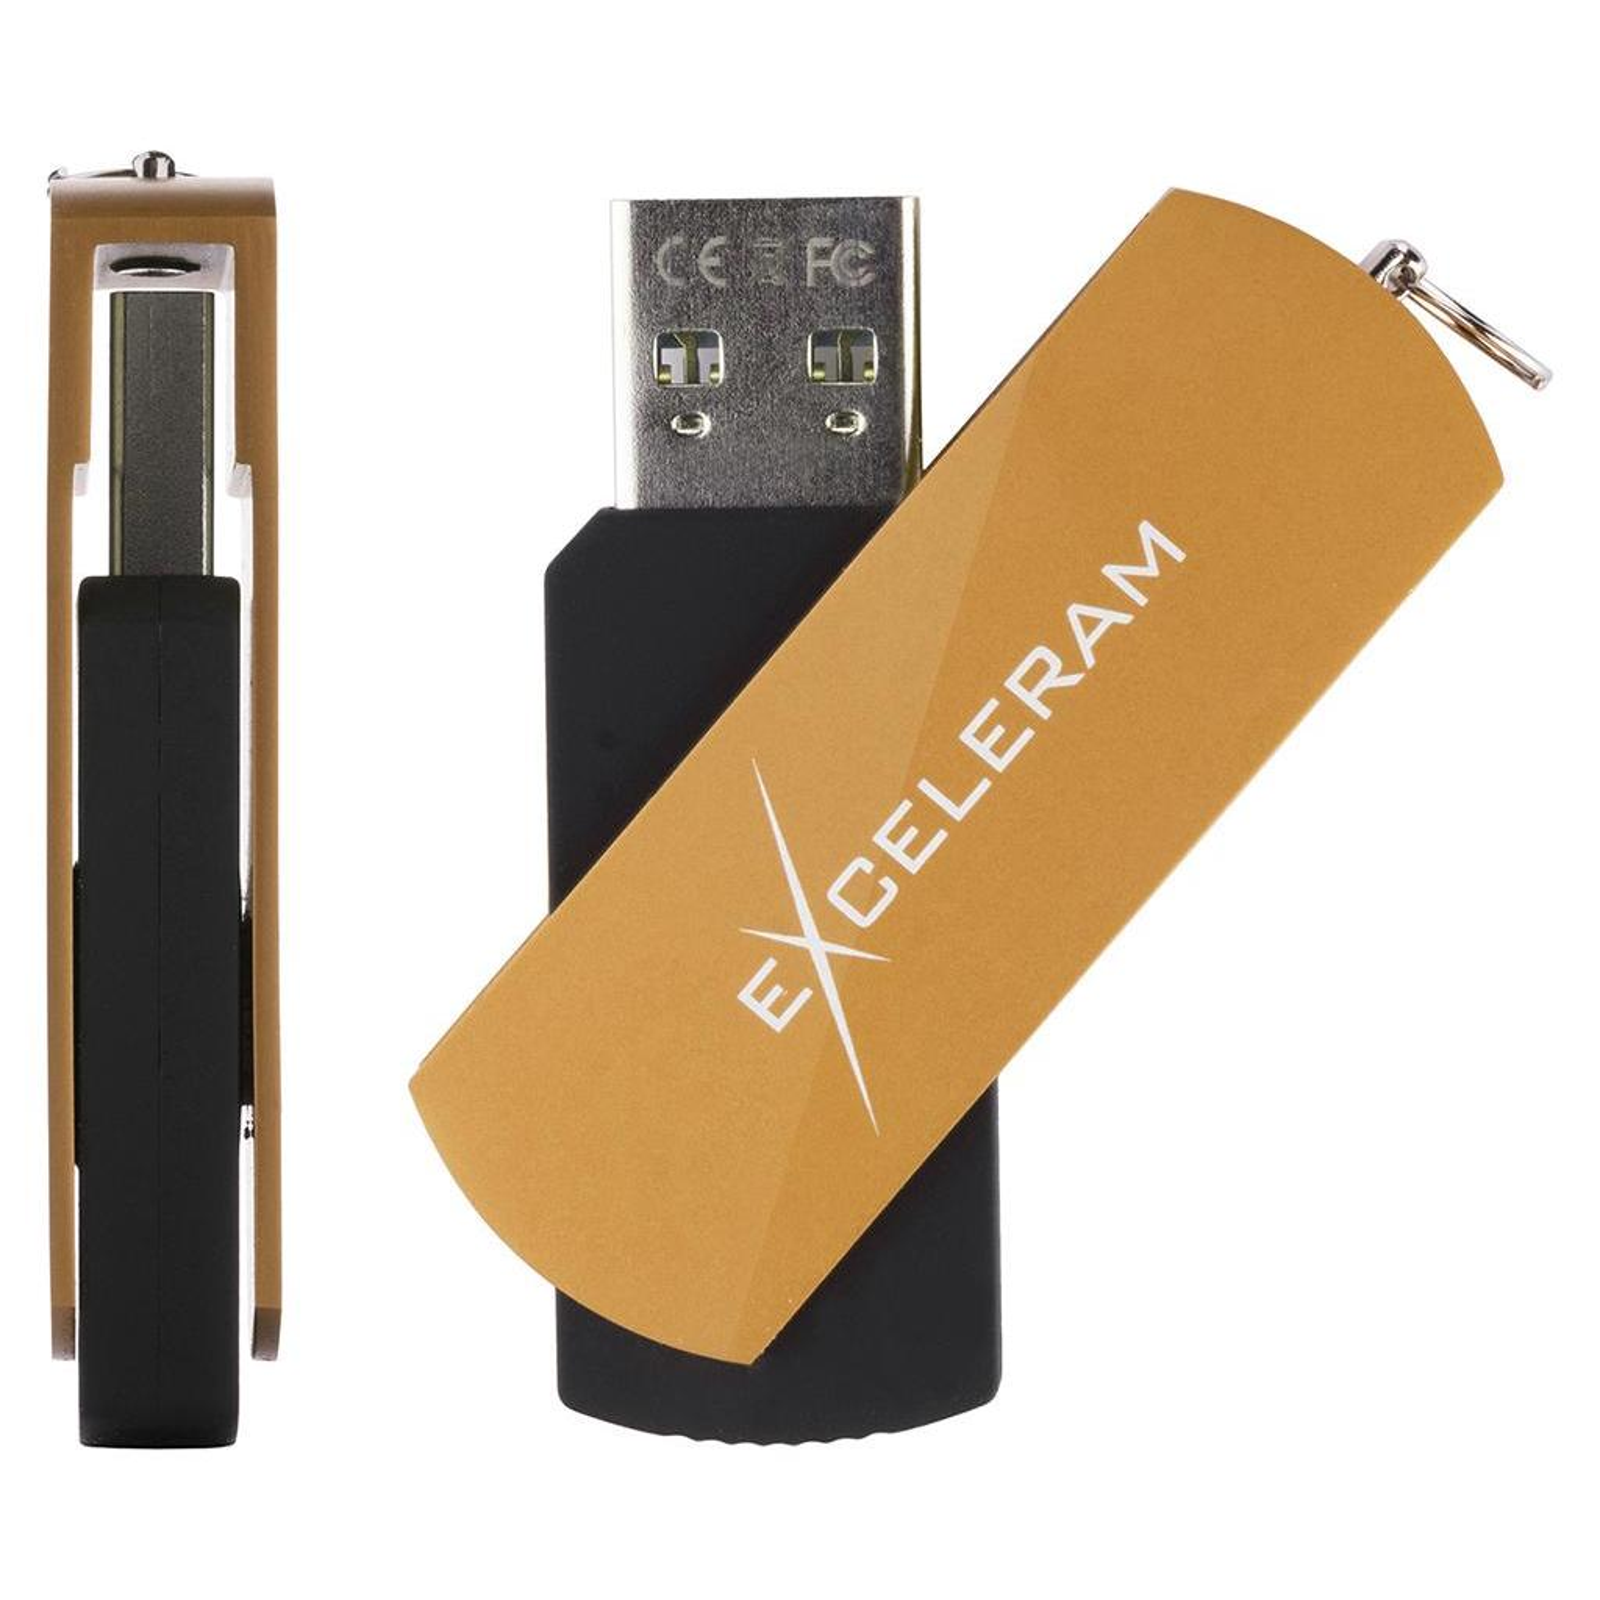 USB флеш накопитель eXceleram 32GB P2 Series Blue/Black USB 3.1 Gen 1 (EXP2U3BLB32) изображение 4